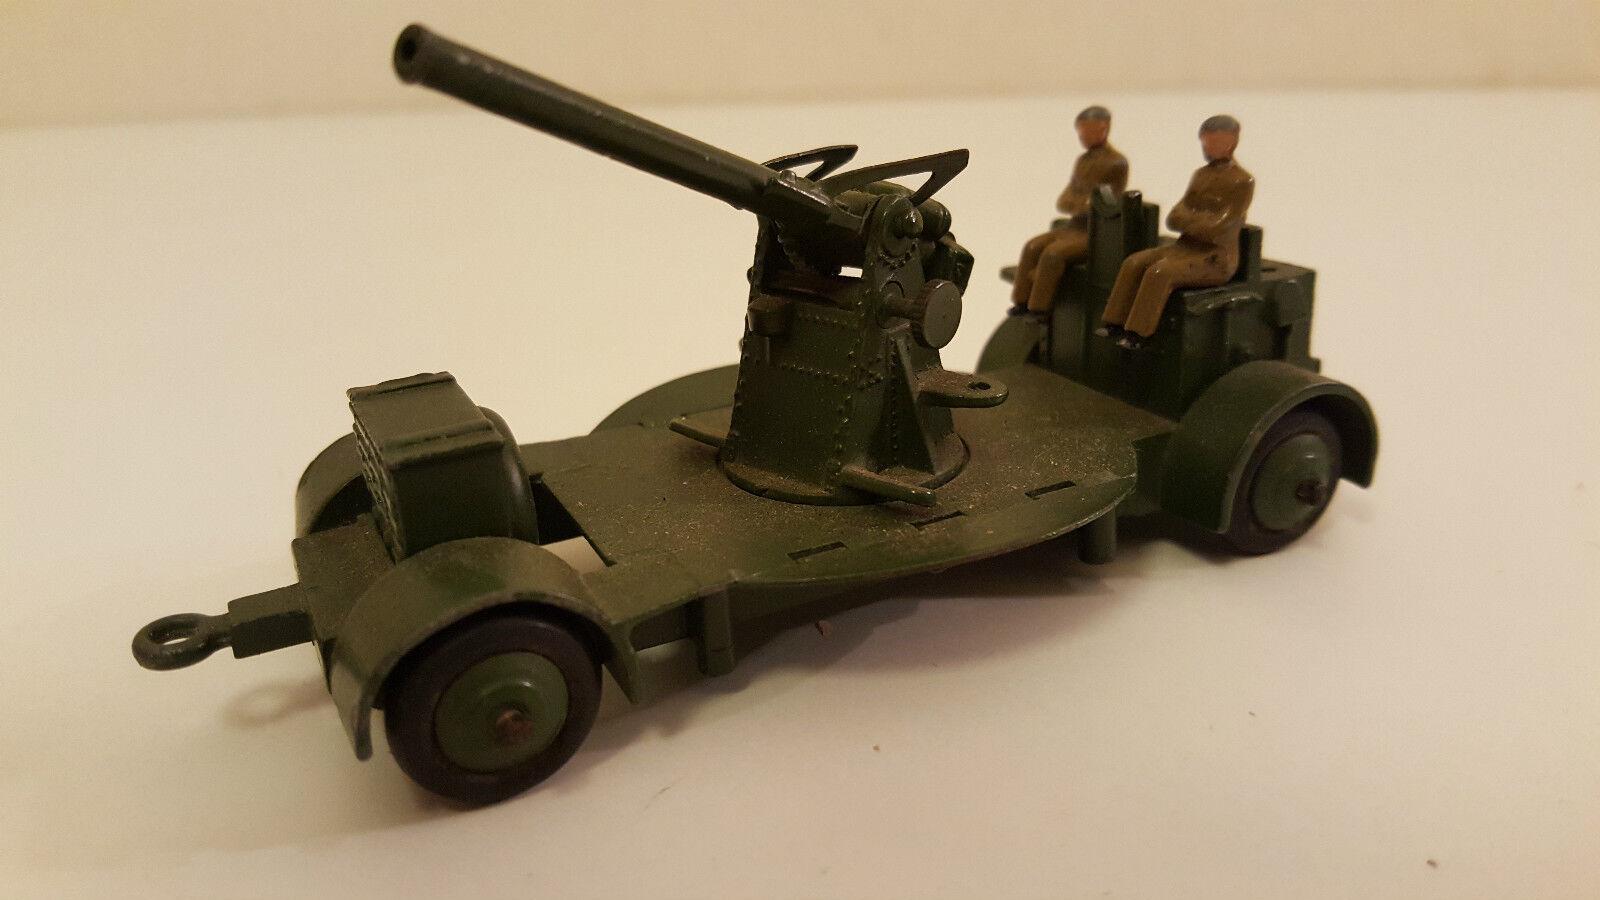 Dinky toys - 161 b 690 us - a a gun on trailer (canon dca anti air)